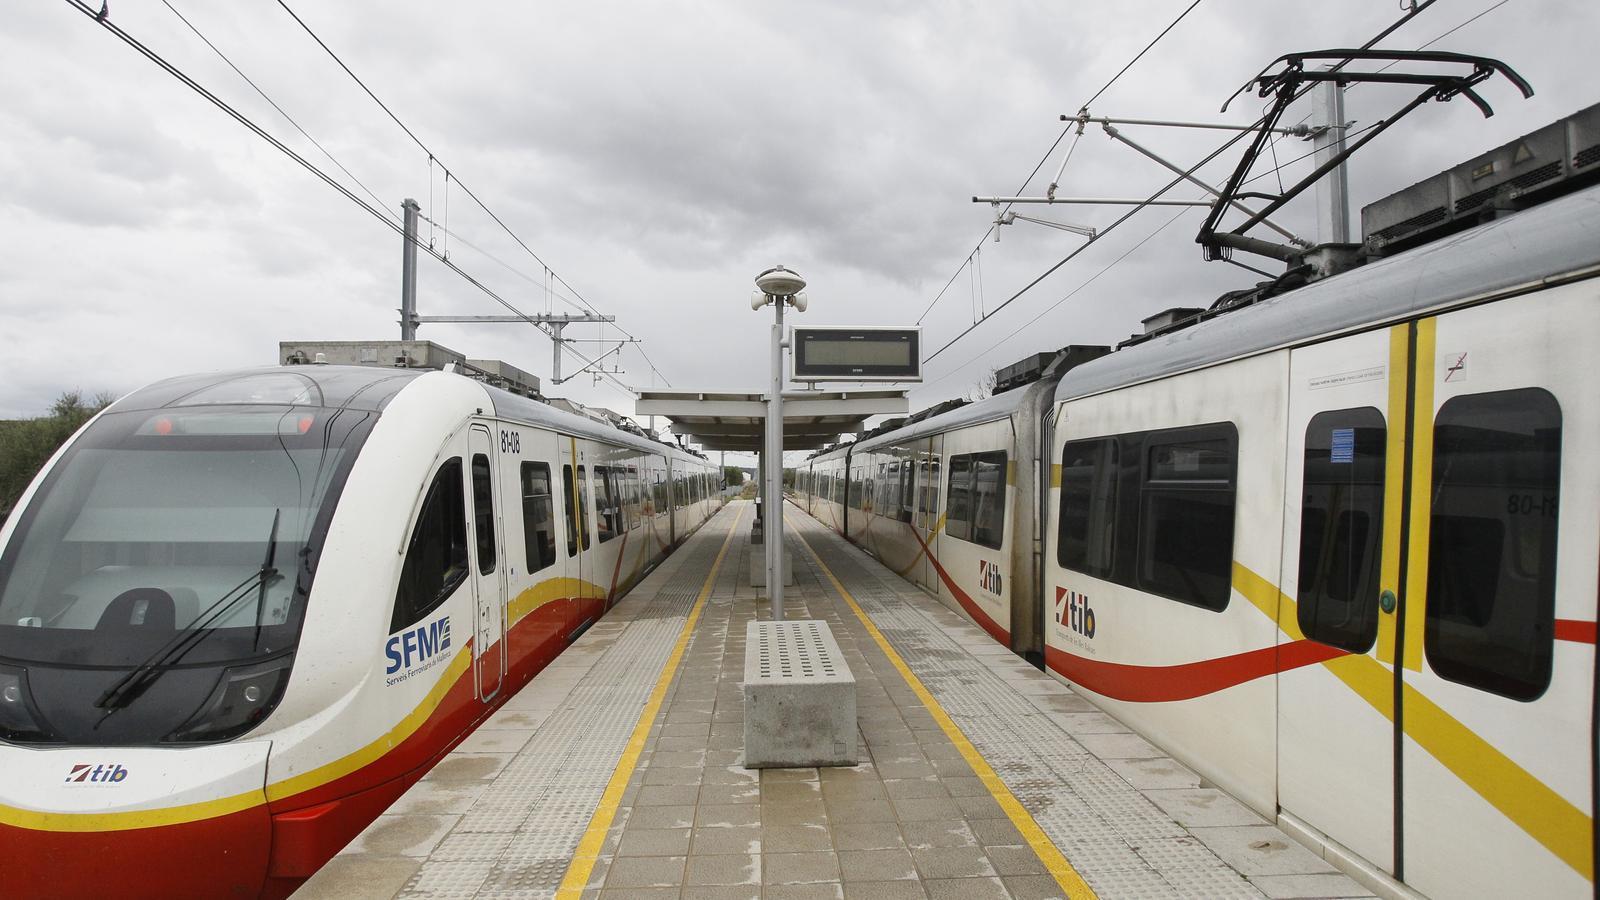 El nou tren elèctric. / ISAAC BUJ